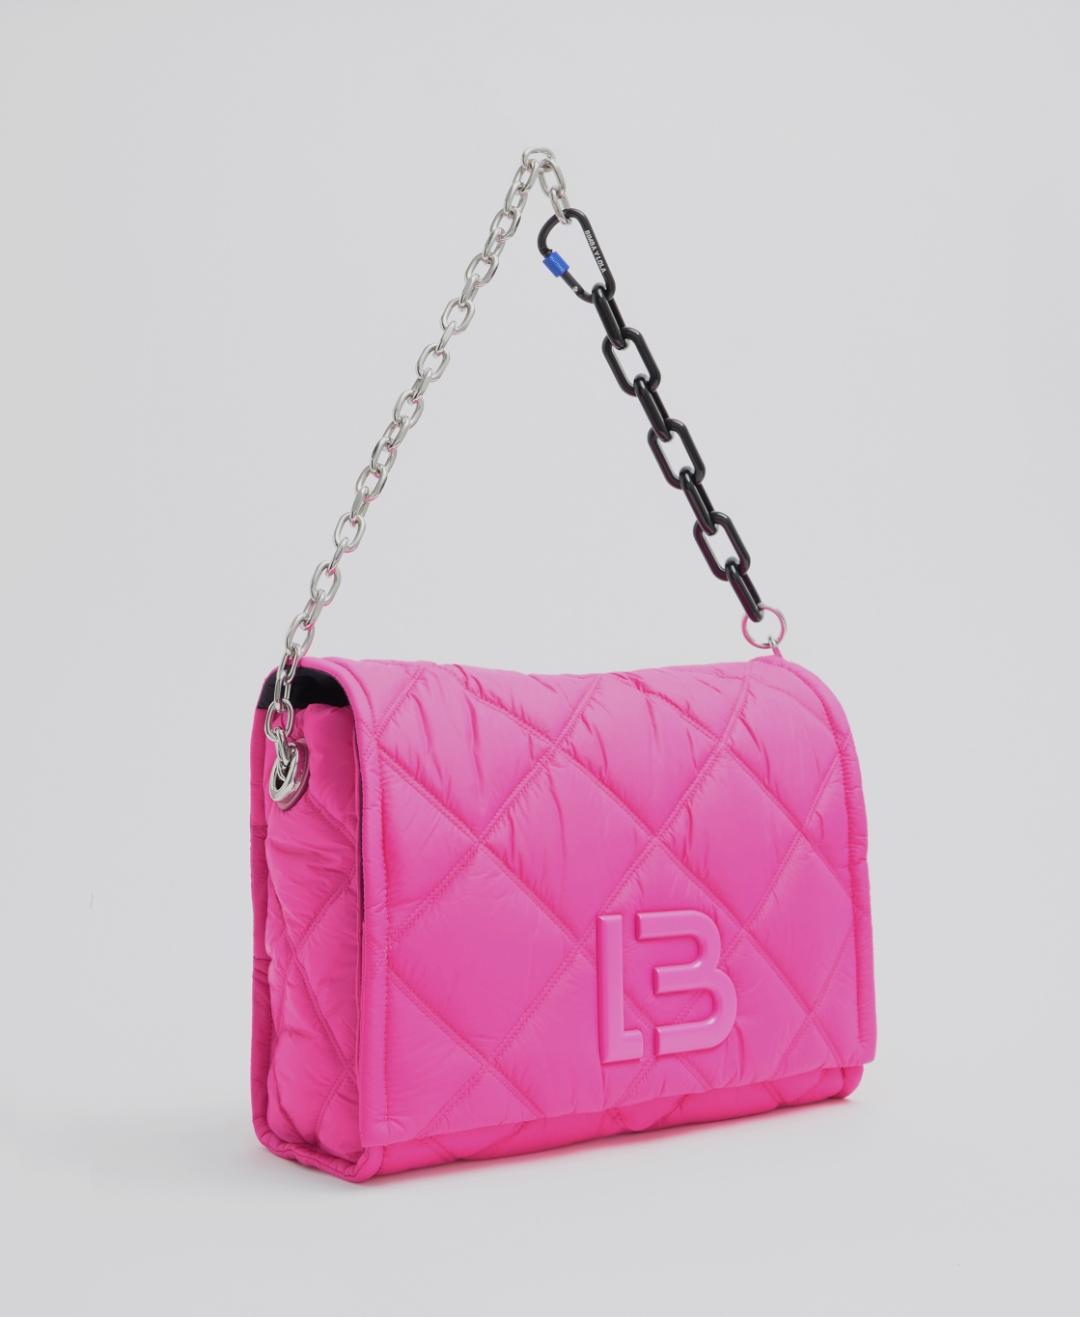 Bolso solapa nylon acolchado rosa